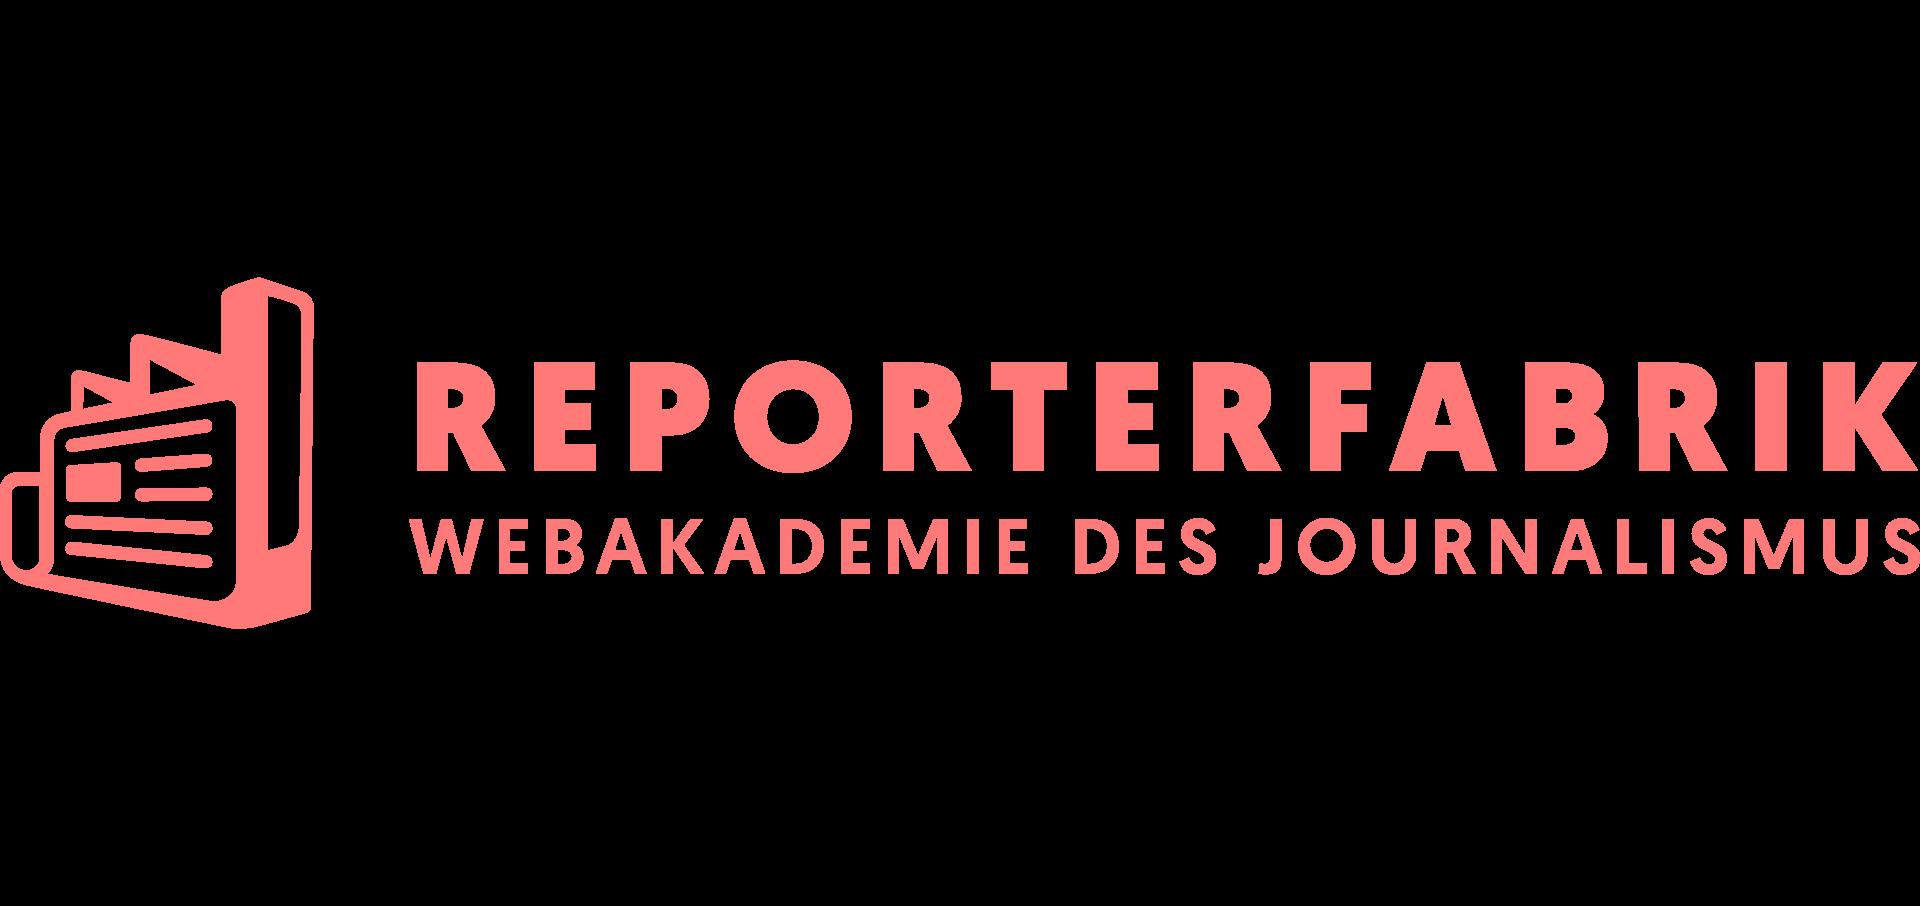 Reporterfabrik correctiv